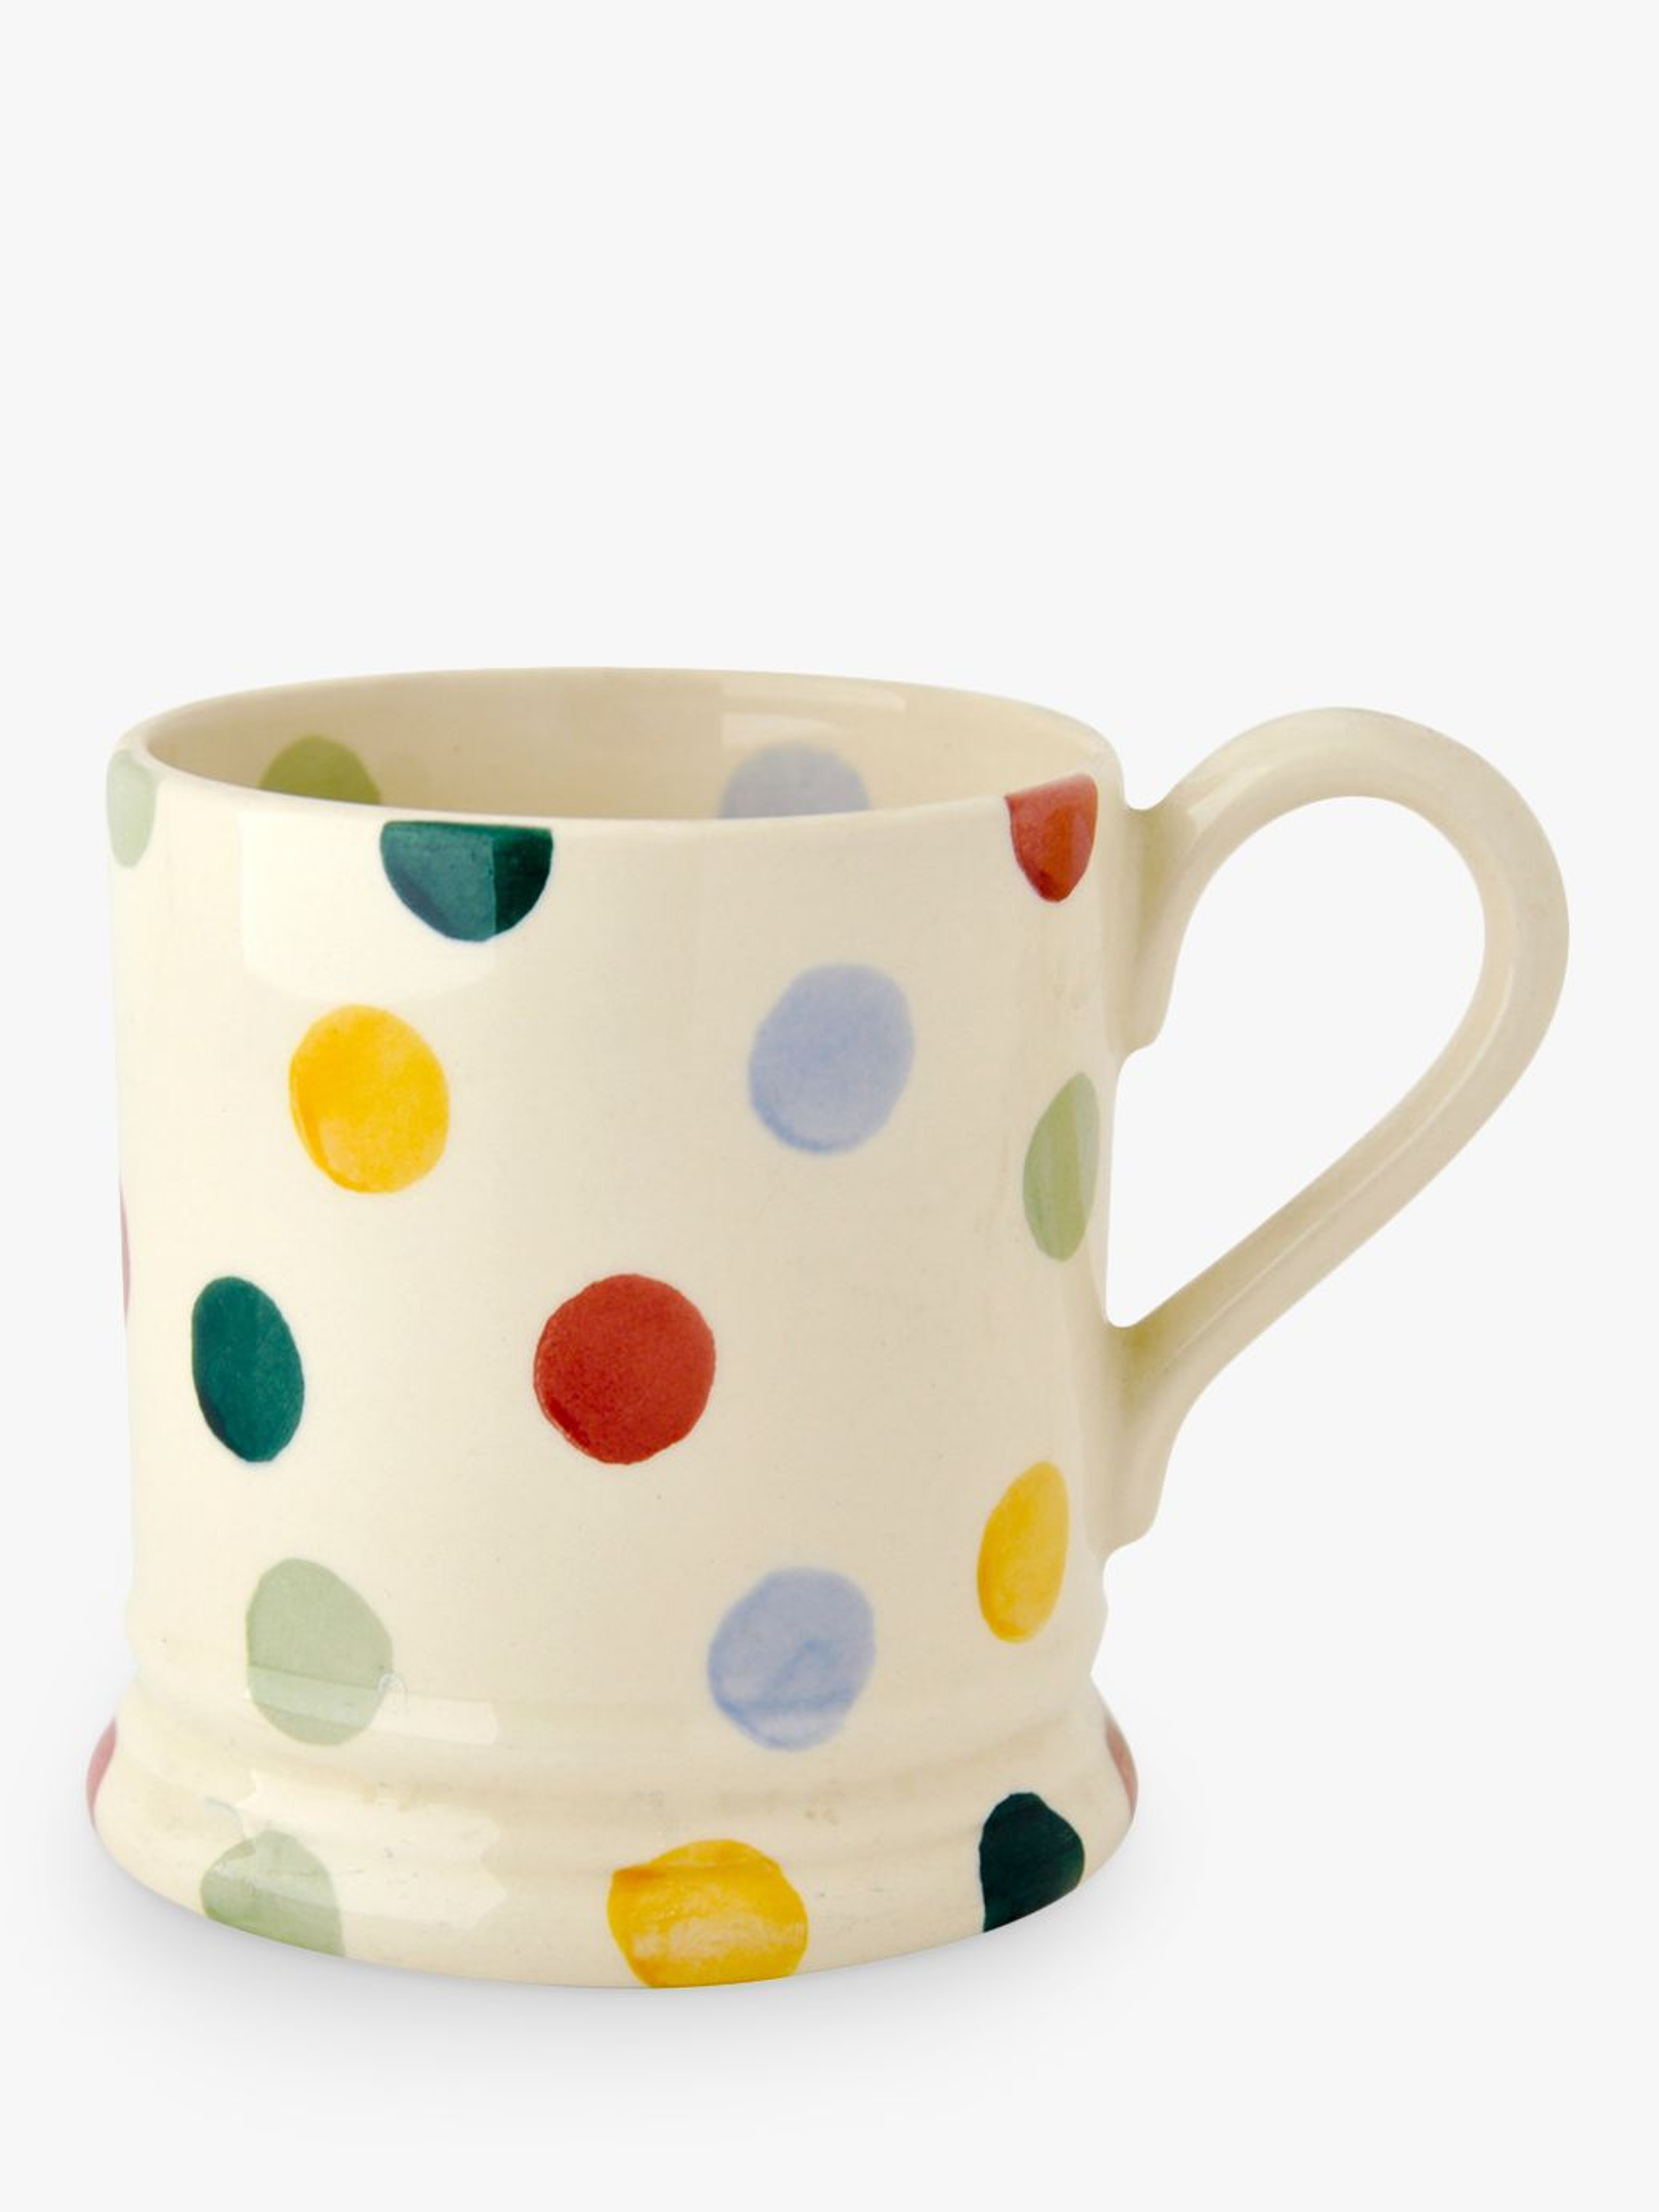 Emma Bridgewater Emma Bridgewater Polka Dot Mug, Multi, 285ml